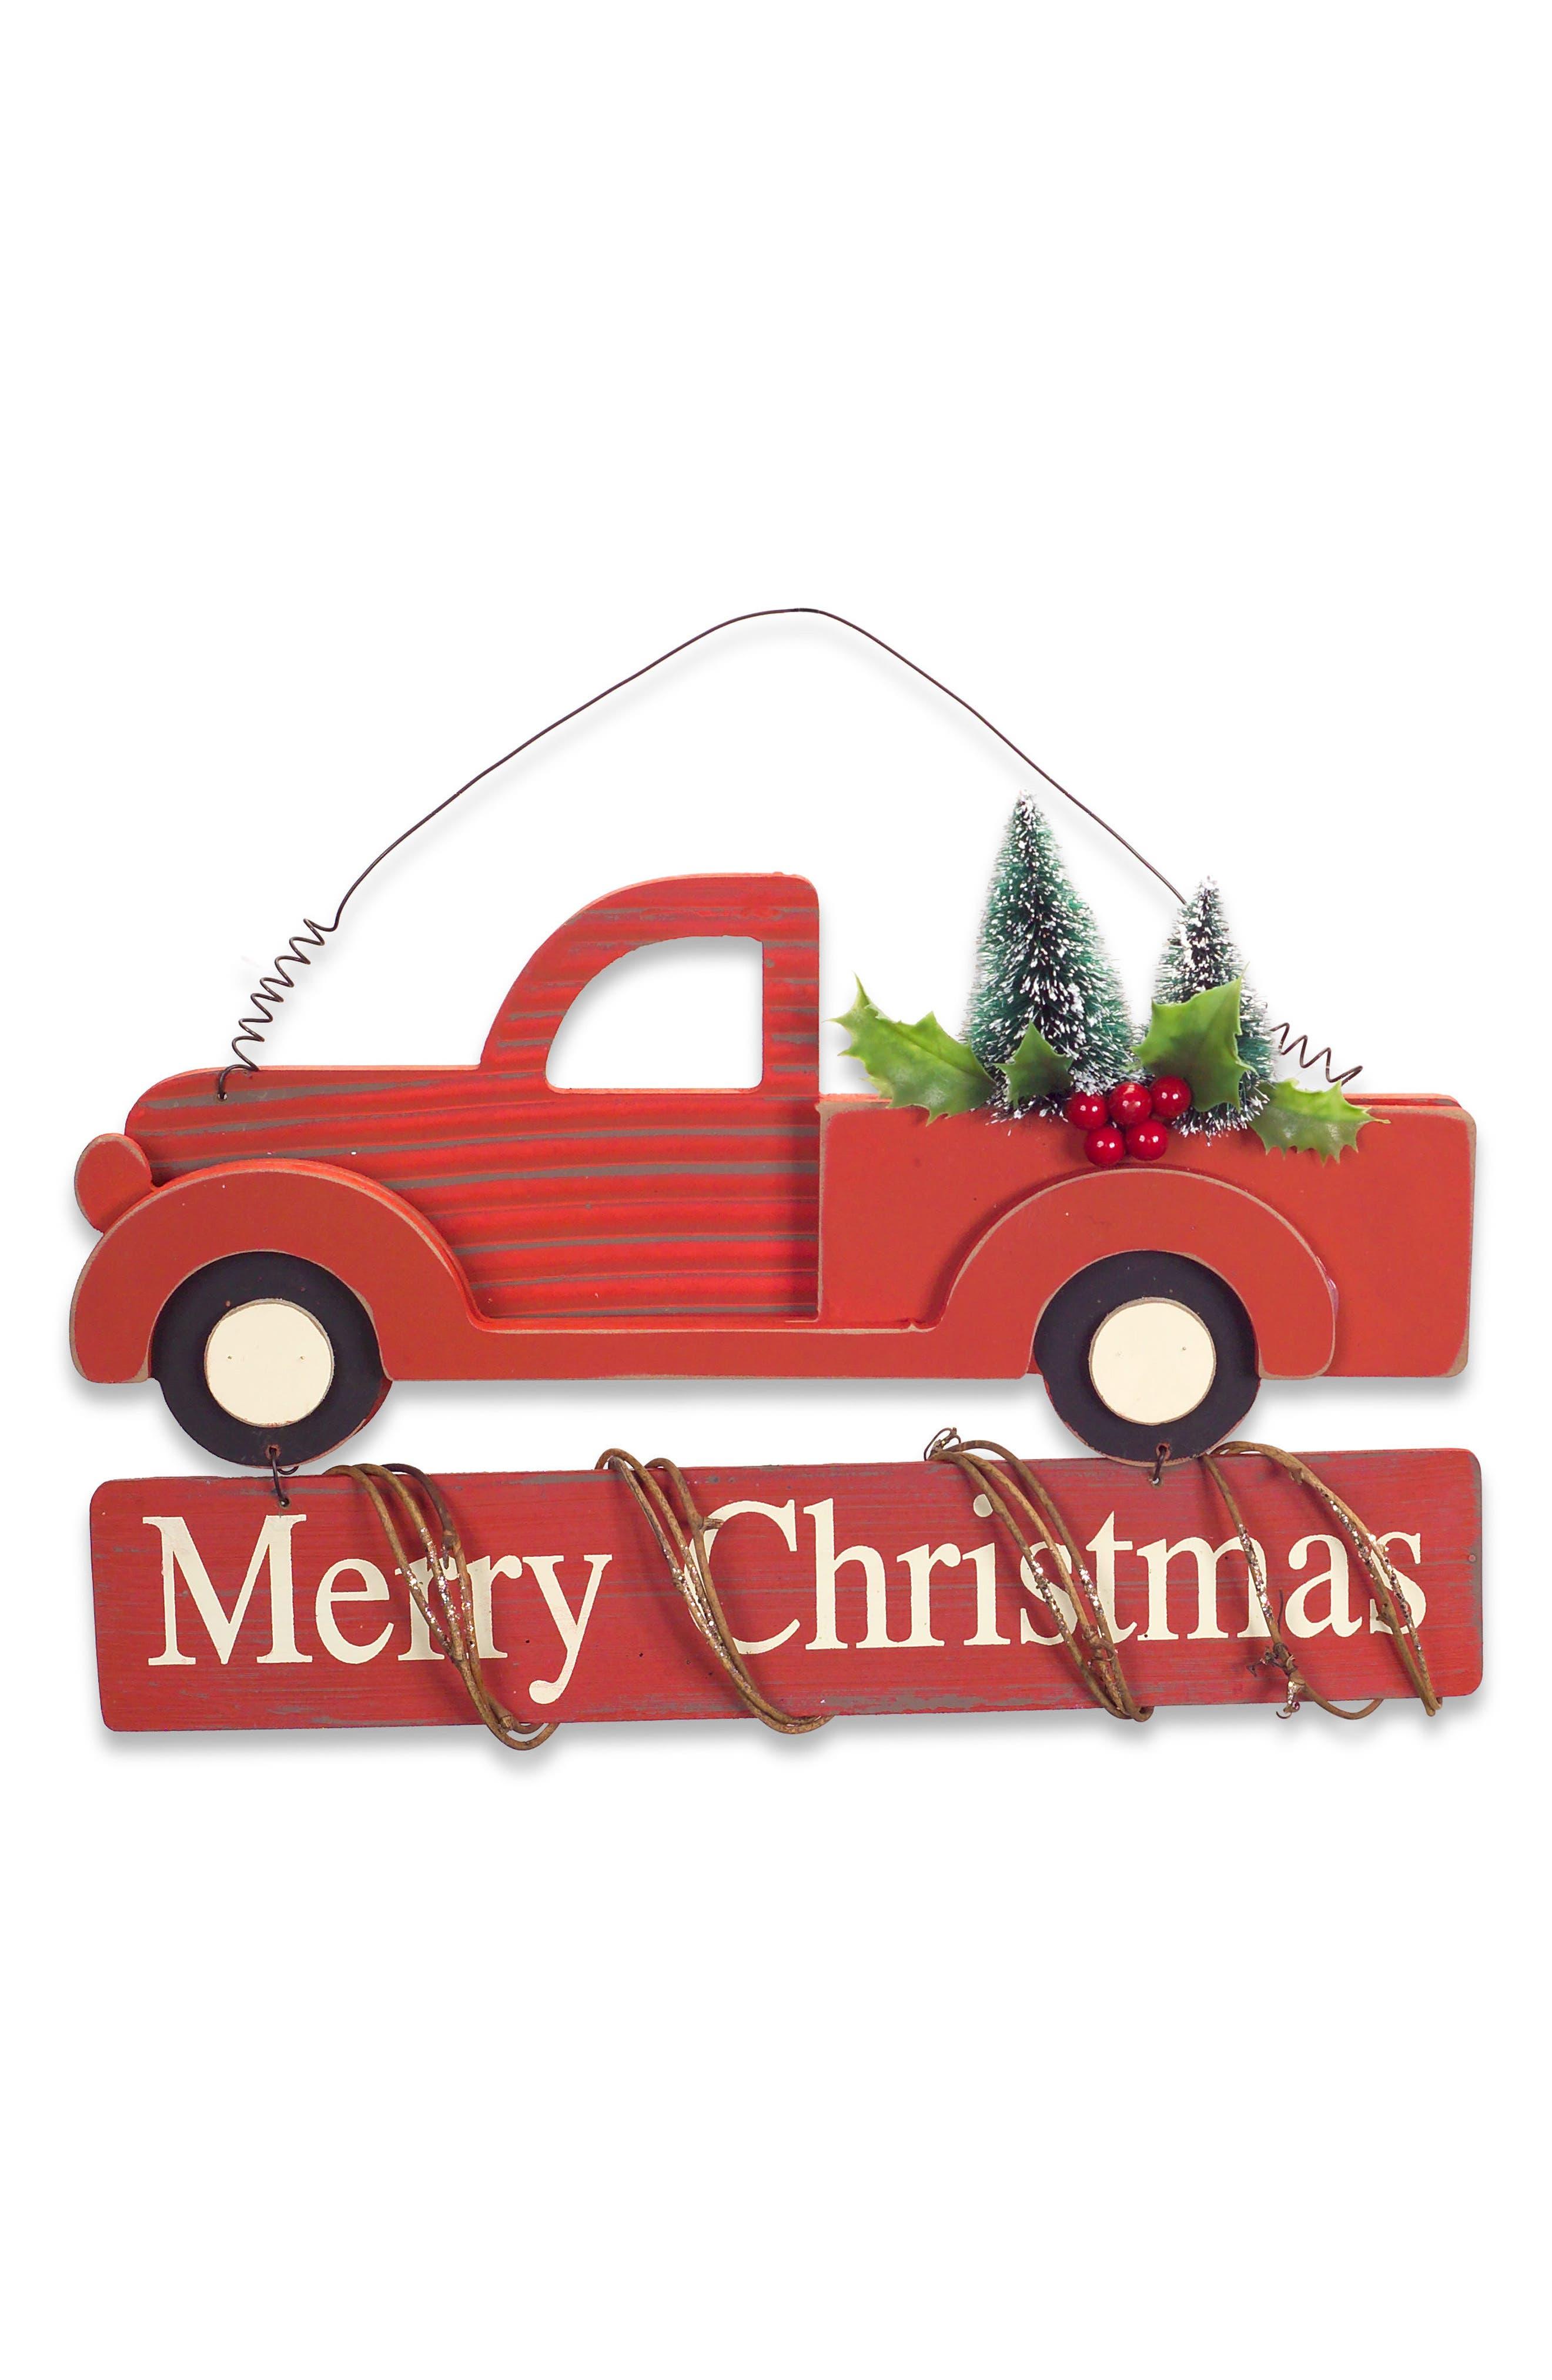 Merry Christmas Wall Art,                             Main thumbnail 1, color,                             600